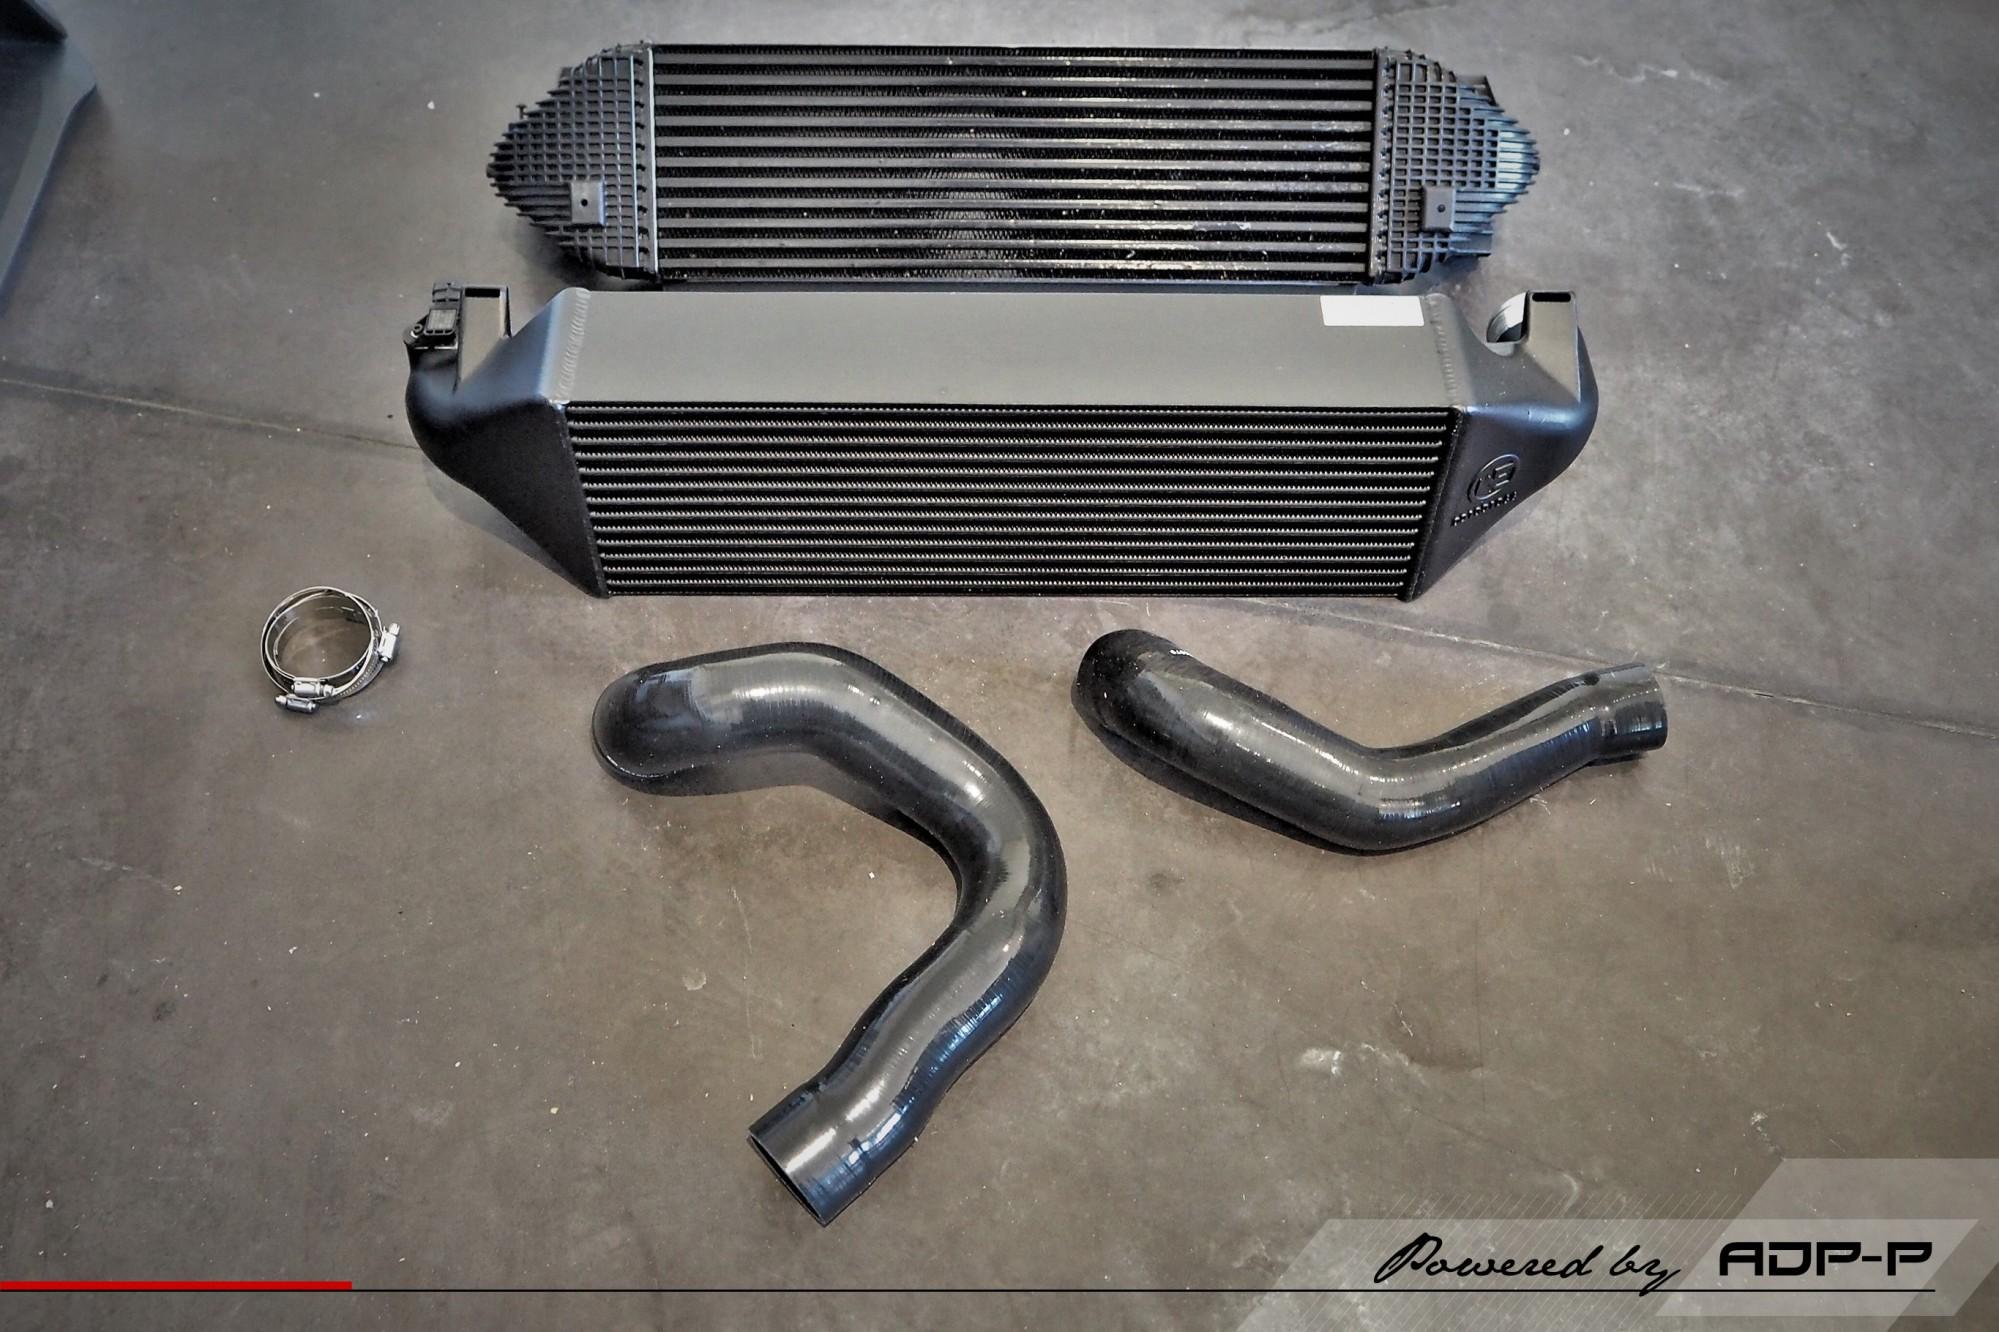 Echangeur Wagner Nimes, Aix en Provence et Avignon - Ford Focus RS 2.3T Ecoboost 350cv - ADP Performance